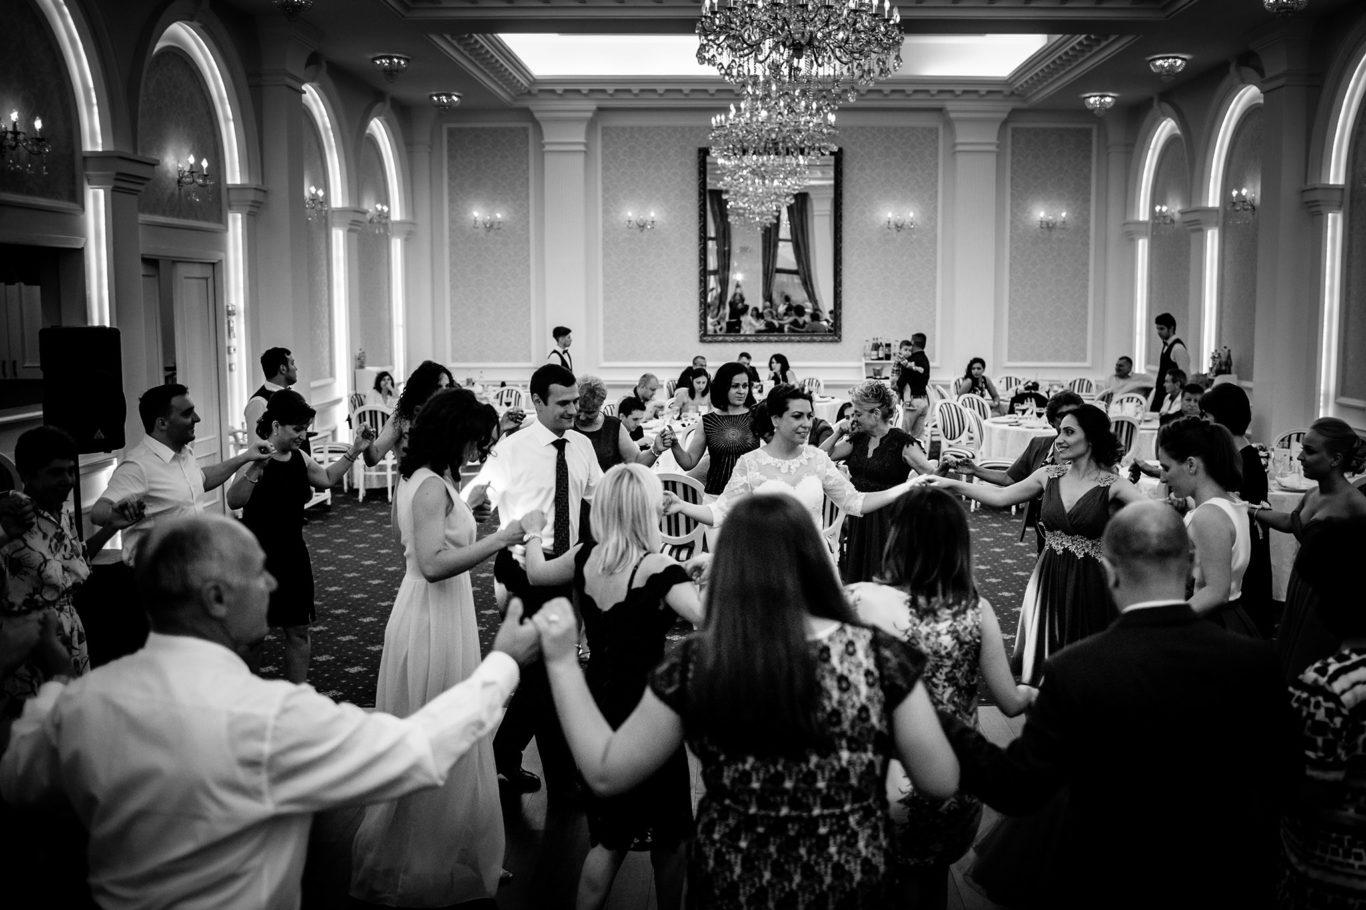 0580-fotografie-nunta-bucuresti-anca-george-fotograf-ciprian-dumitrescu-dcf_5669